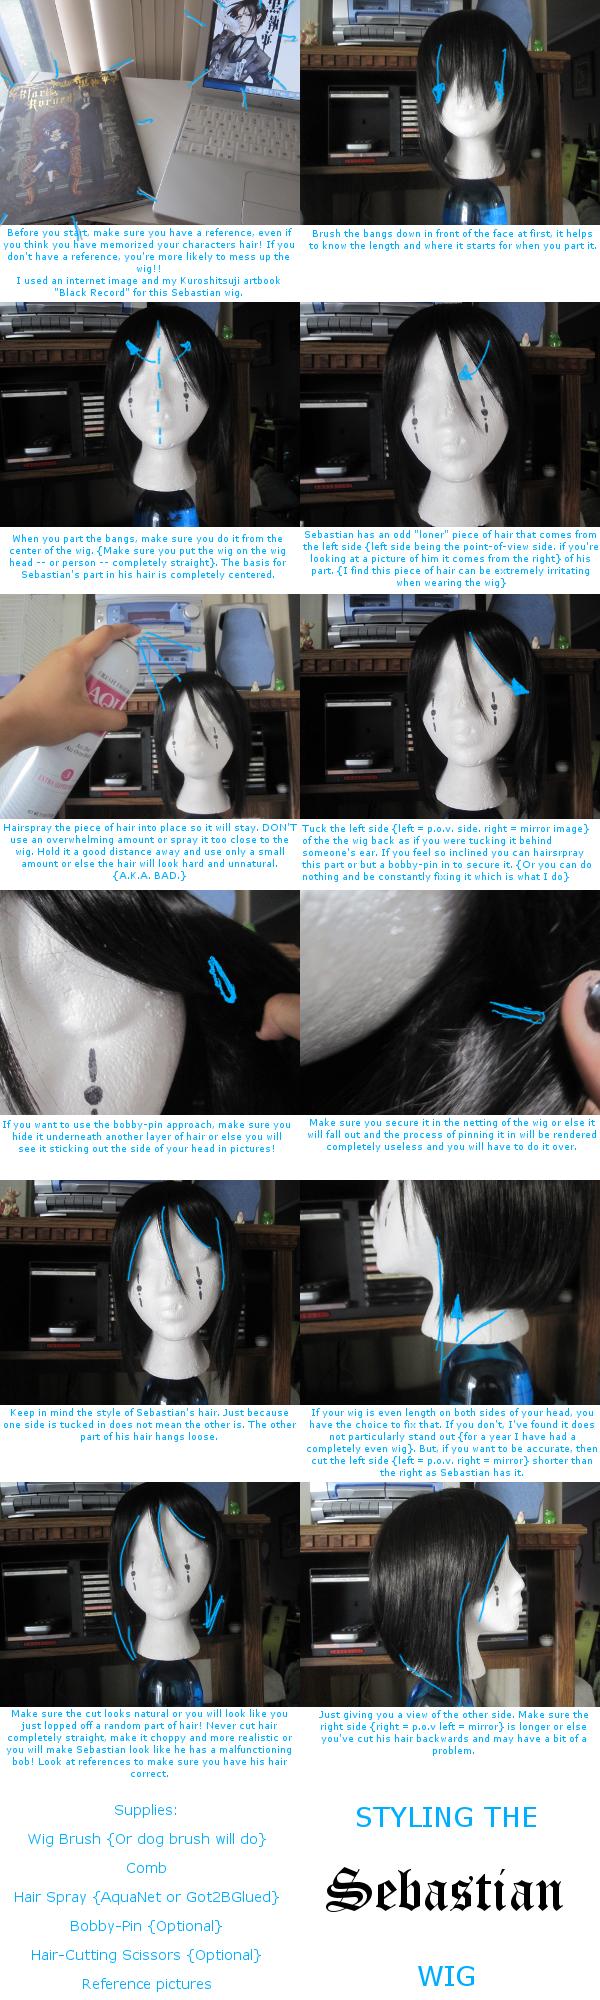 Styling the Sebastian Wig